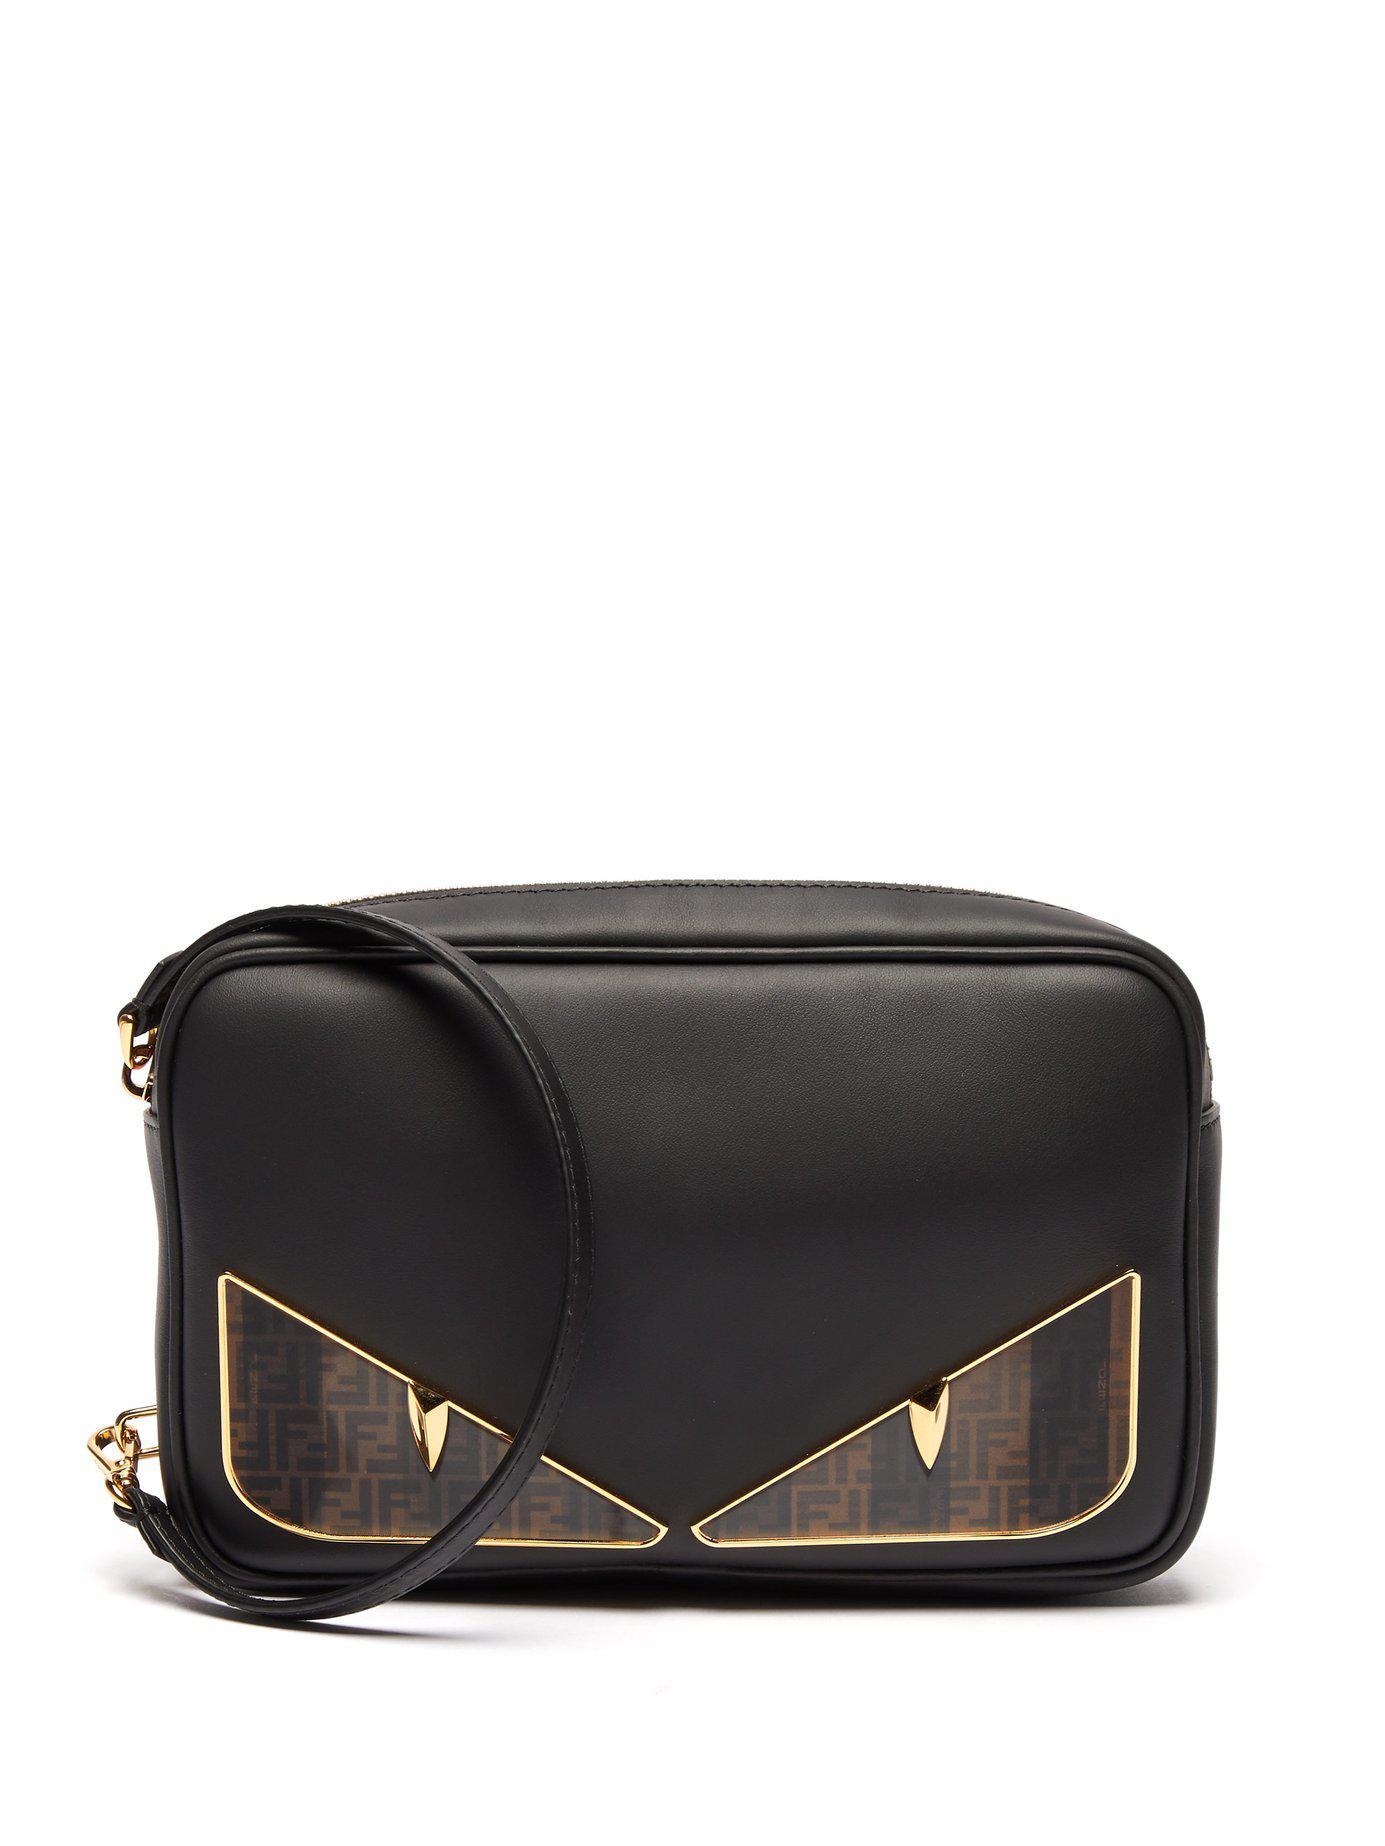 4254b89b743a Lyst - Fendi Bag Bugs Logo Eyes Leather Camera Bag in Black for Men ...